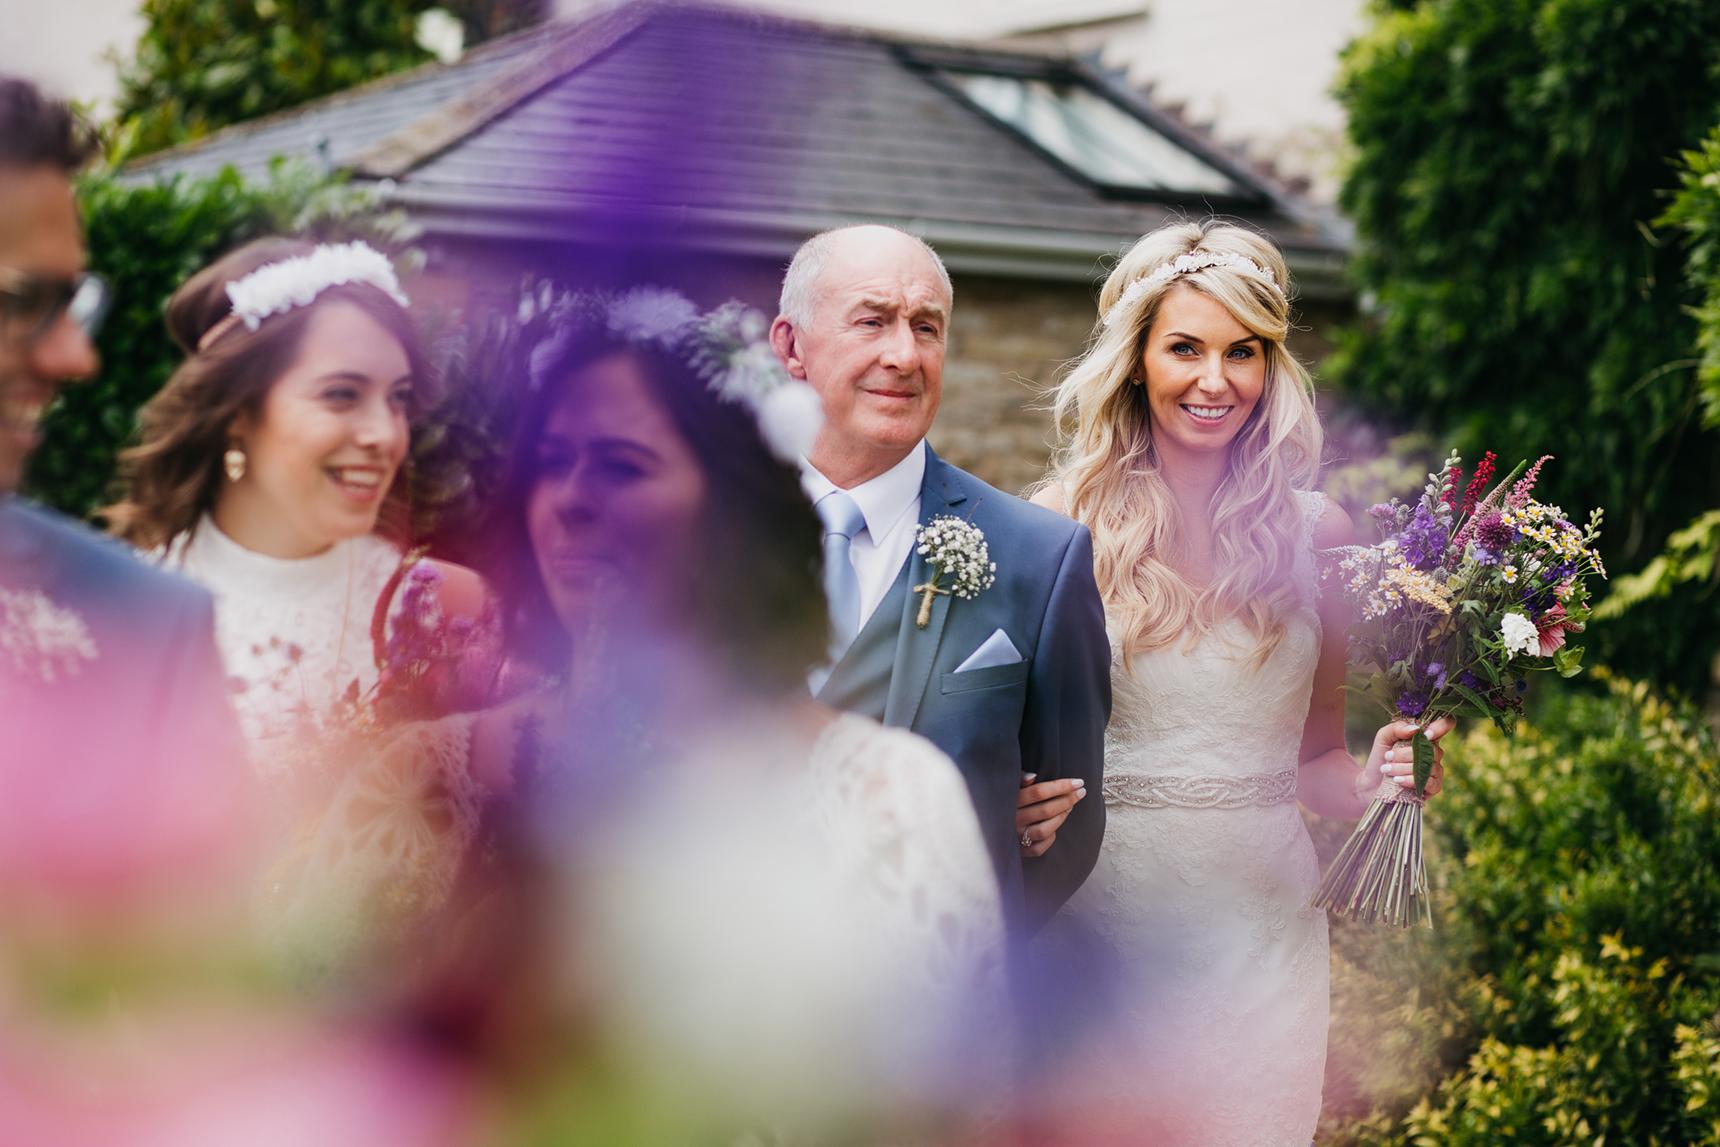 Weddings at Talton Lodge